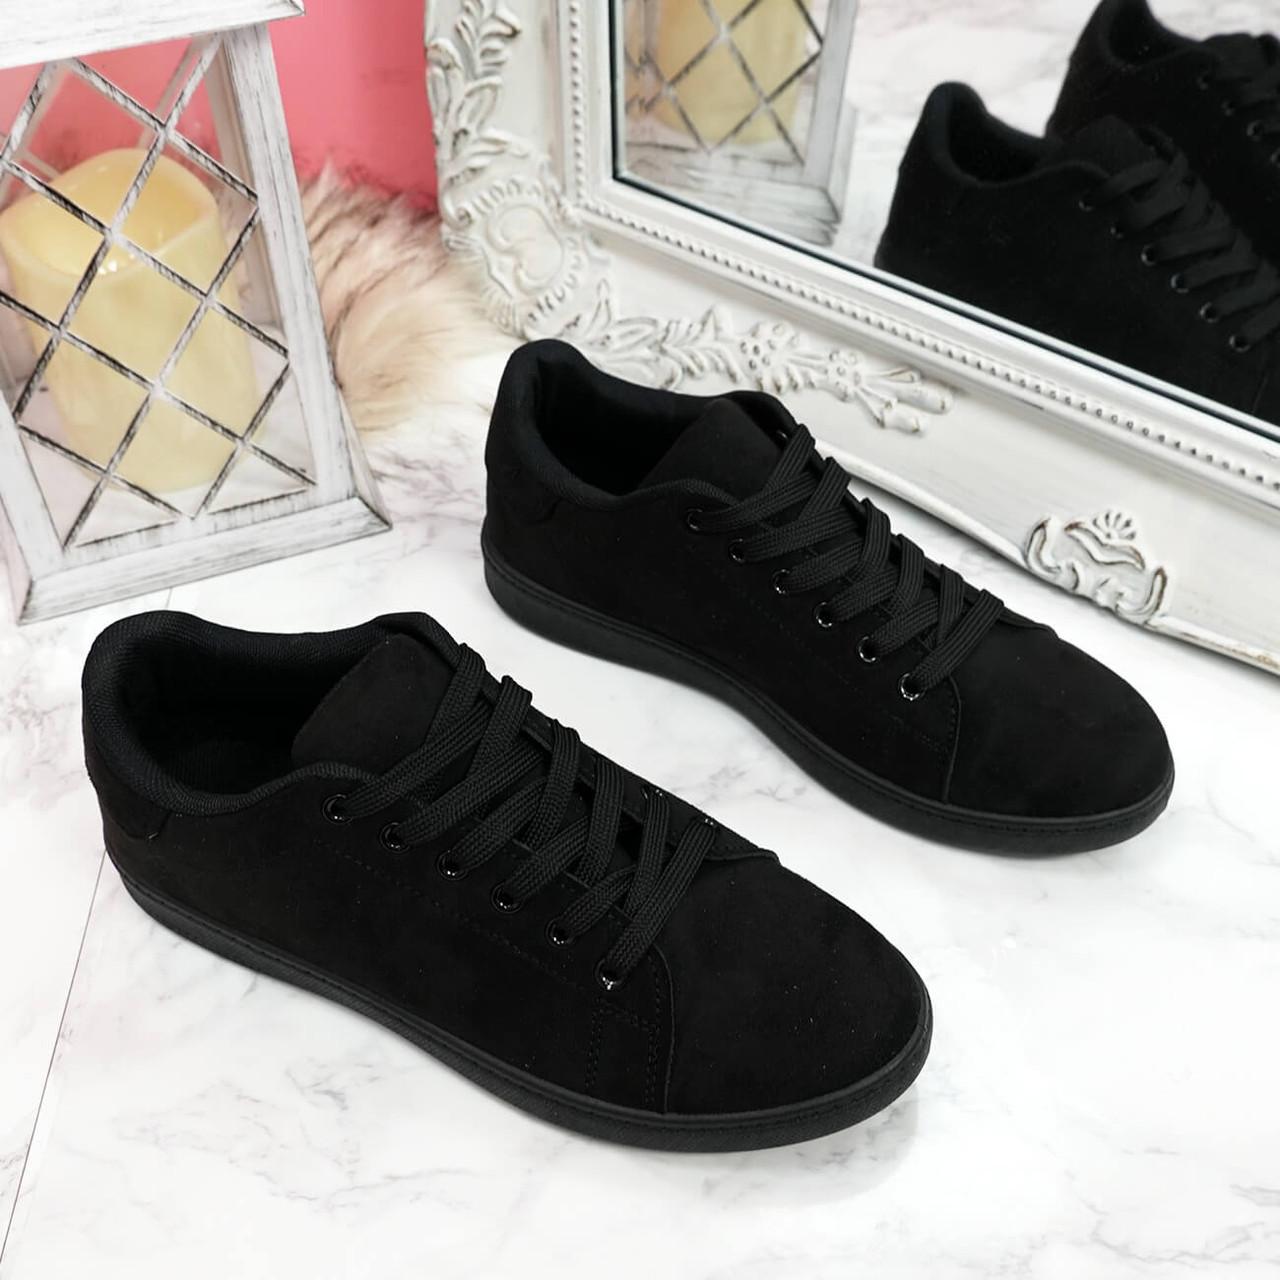 Tedda Black Lace Up Flat Trainers